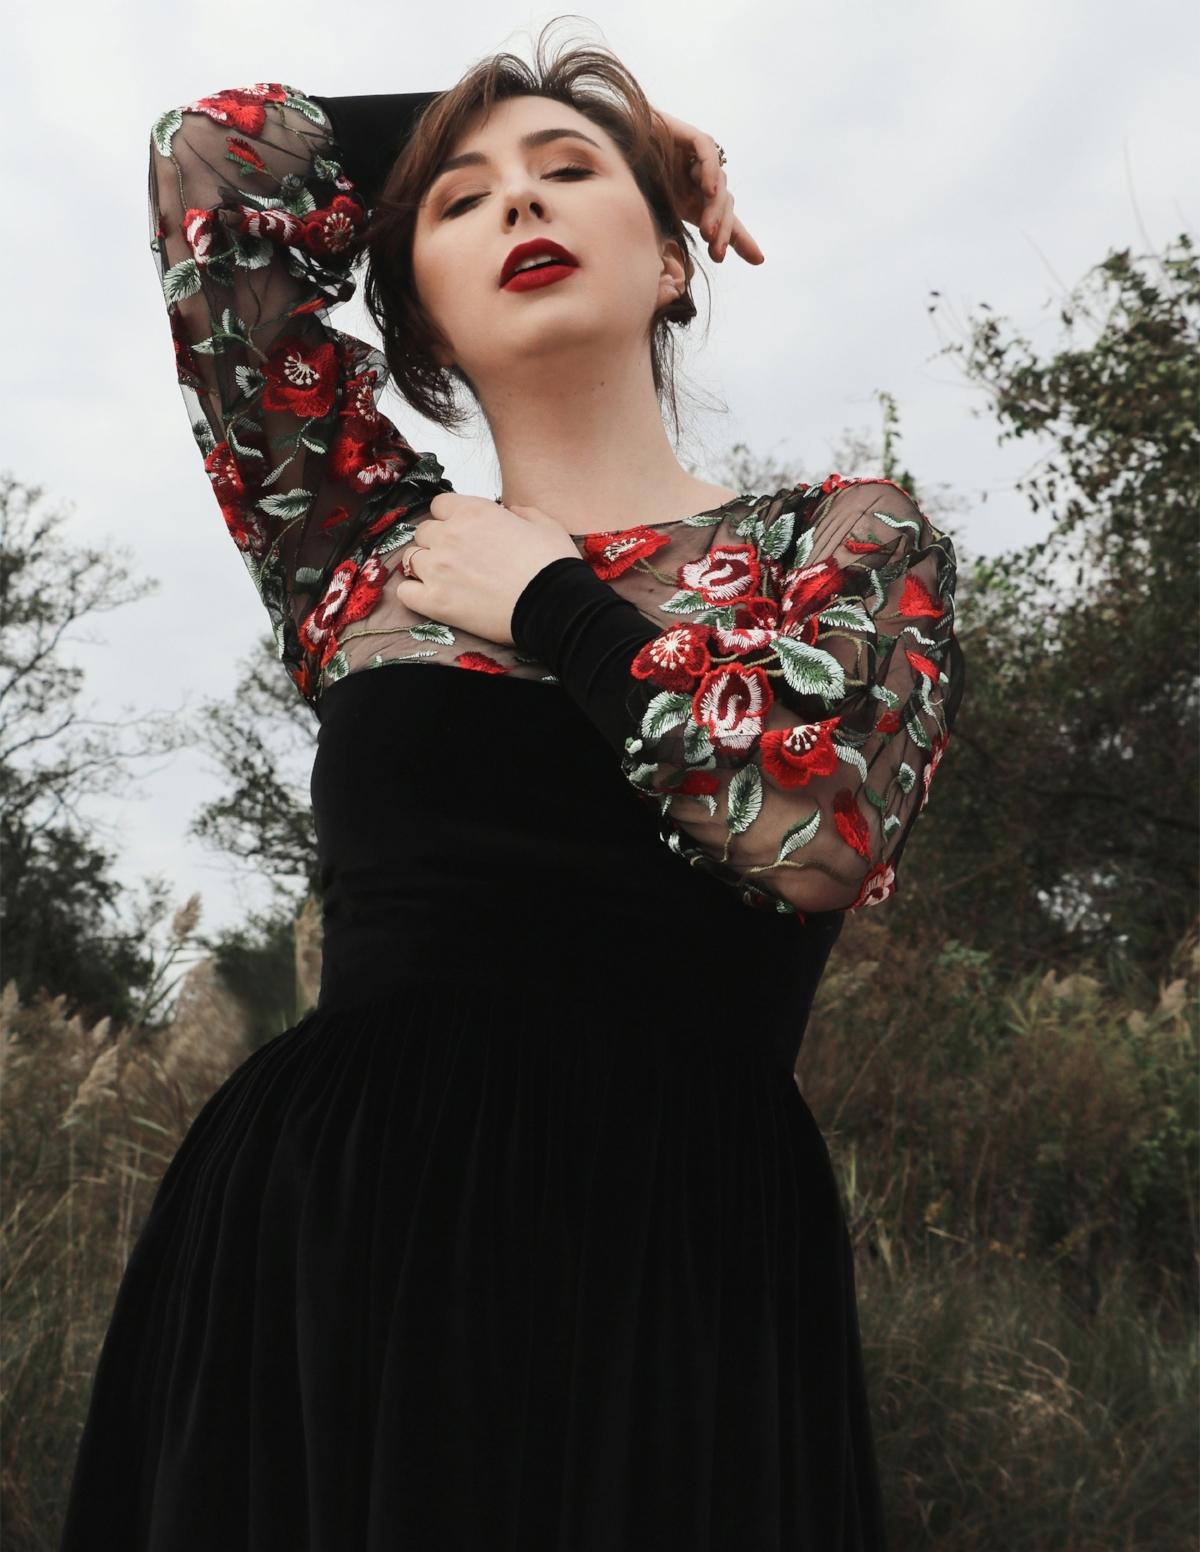 Dress - Sonnet CXVI